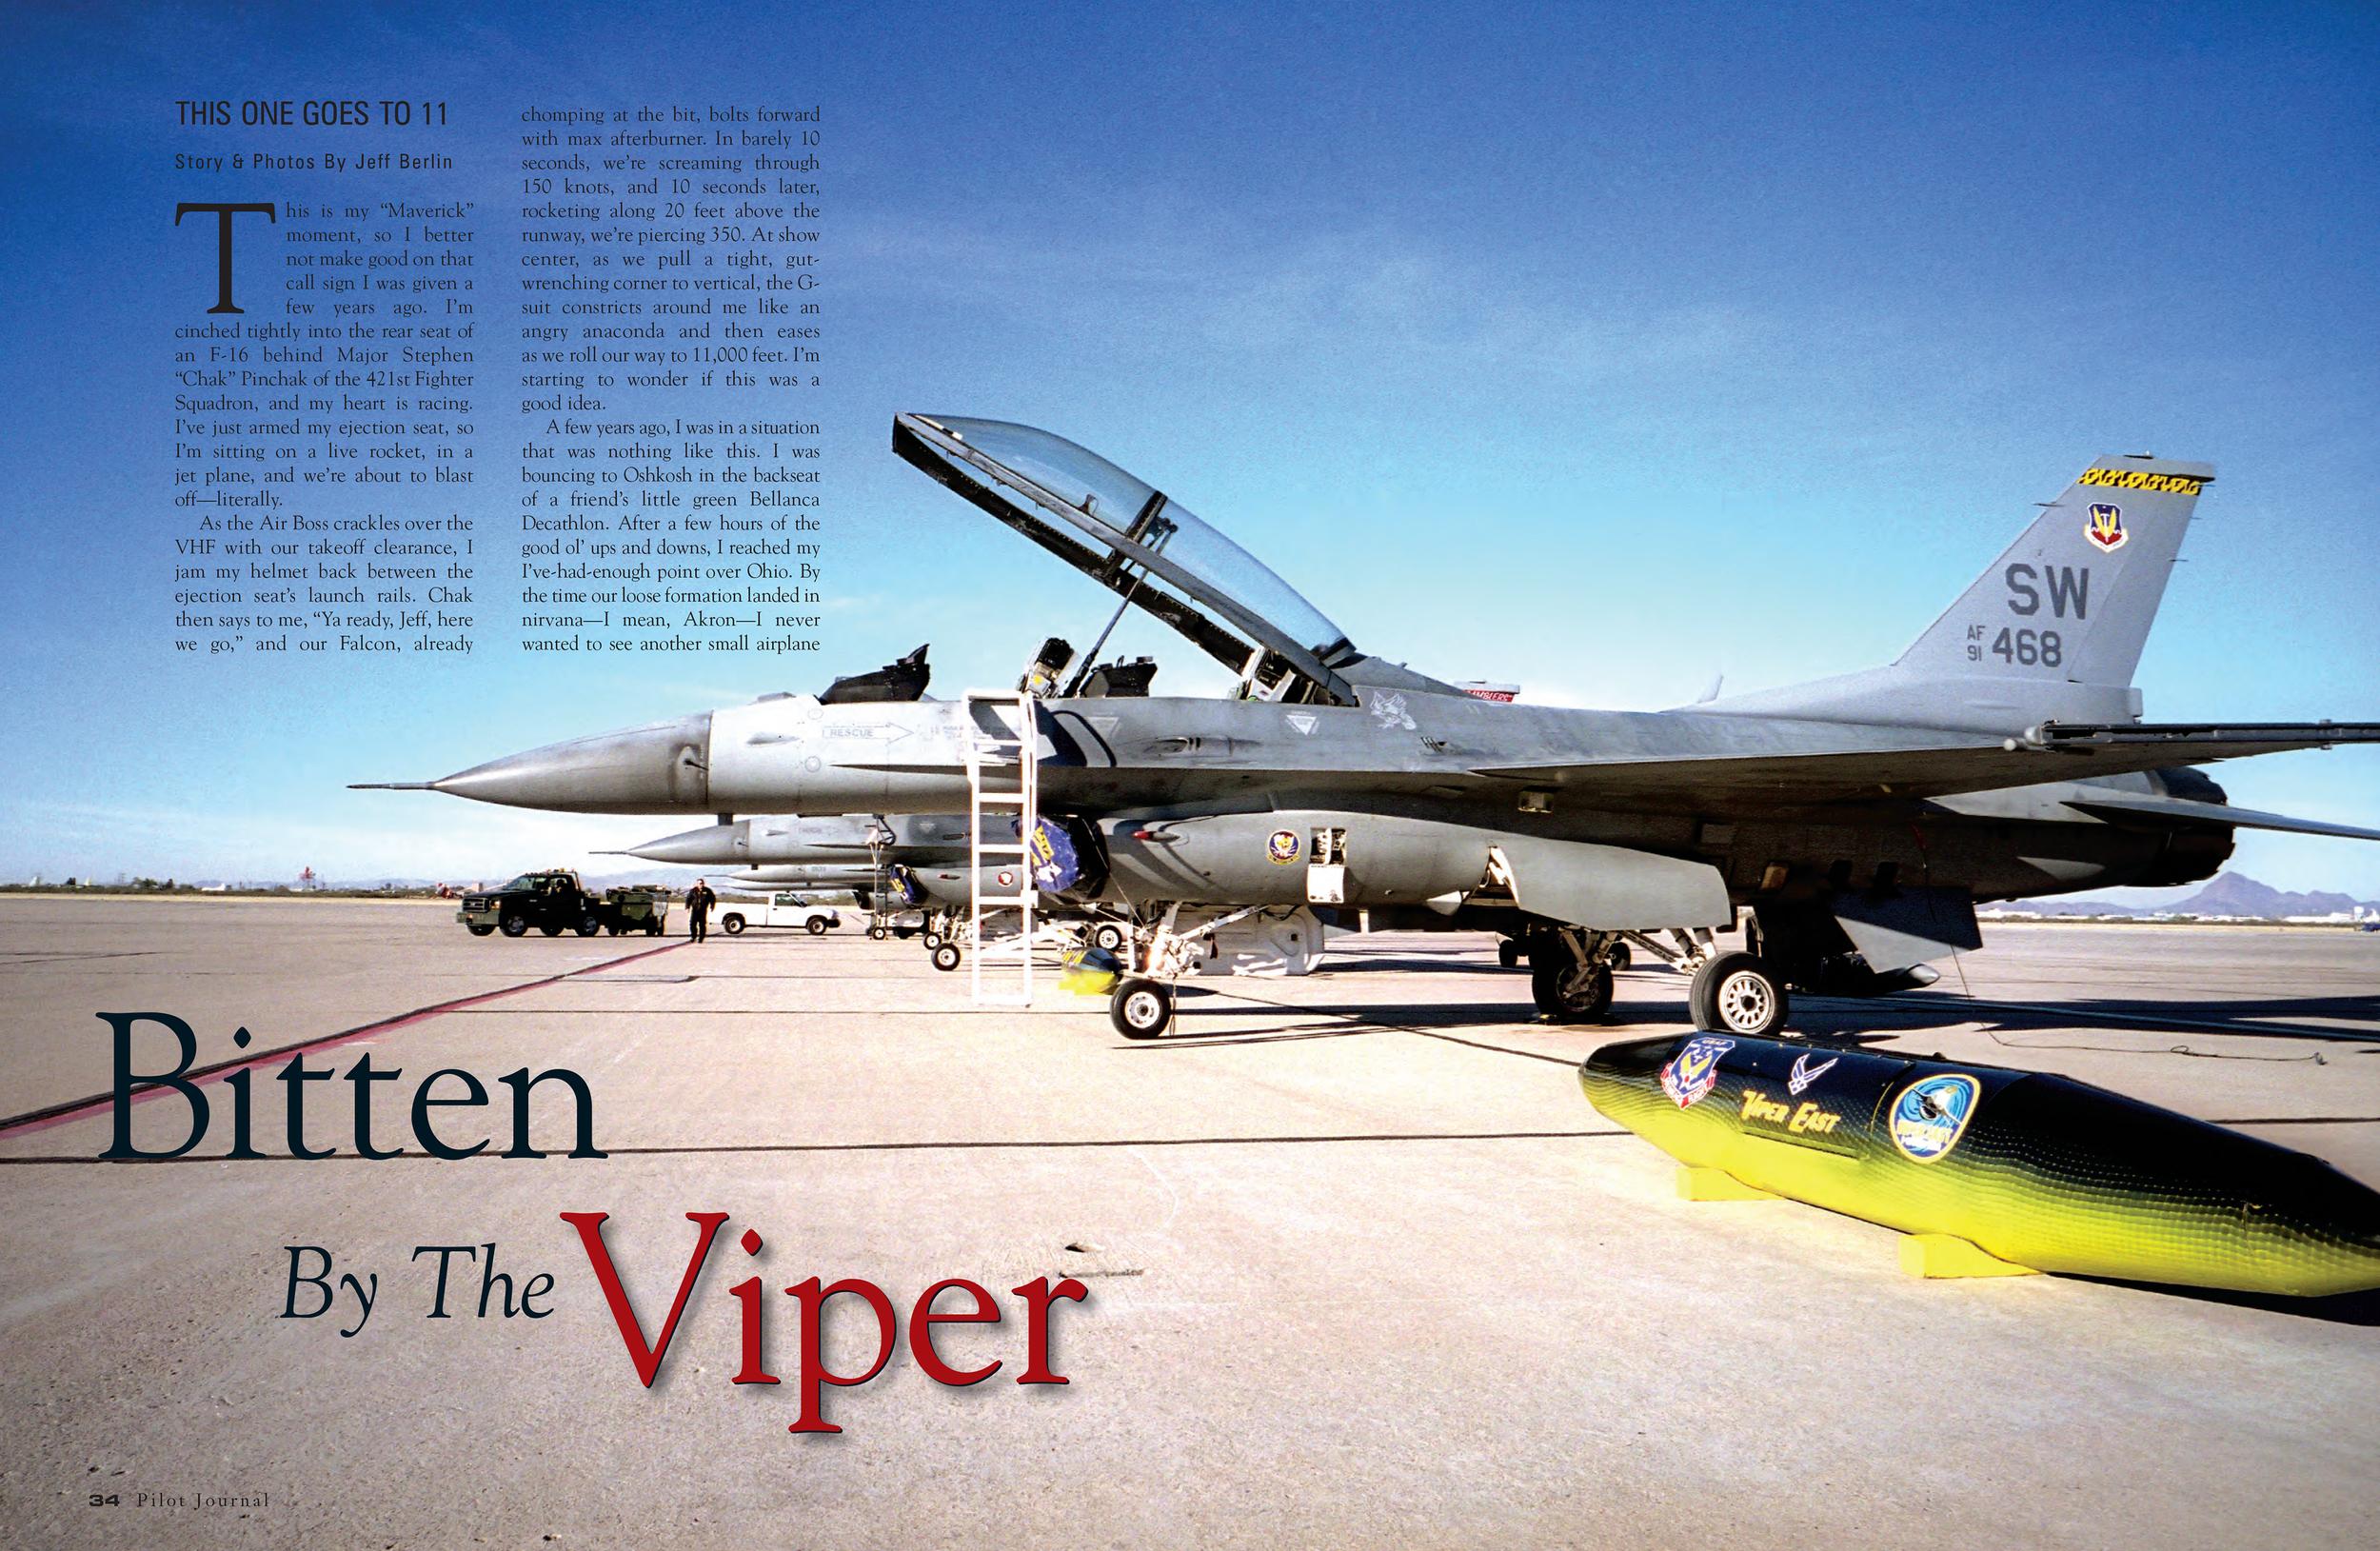 F-16_Layout 1 copy-1.jpg